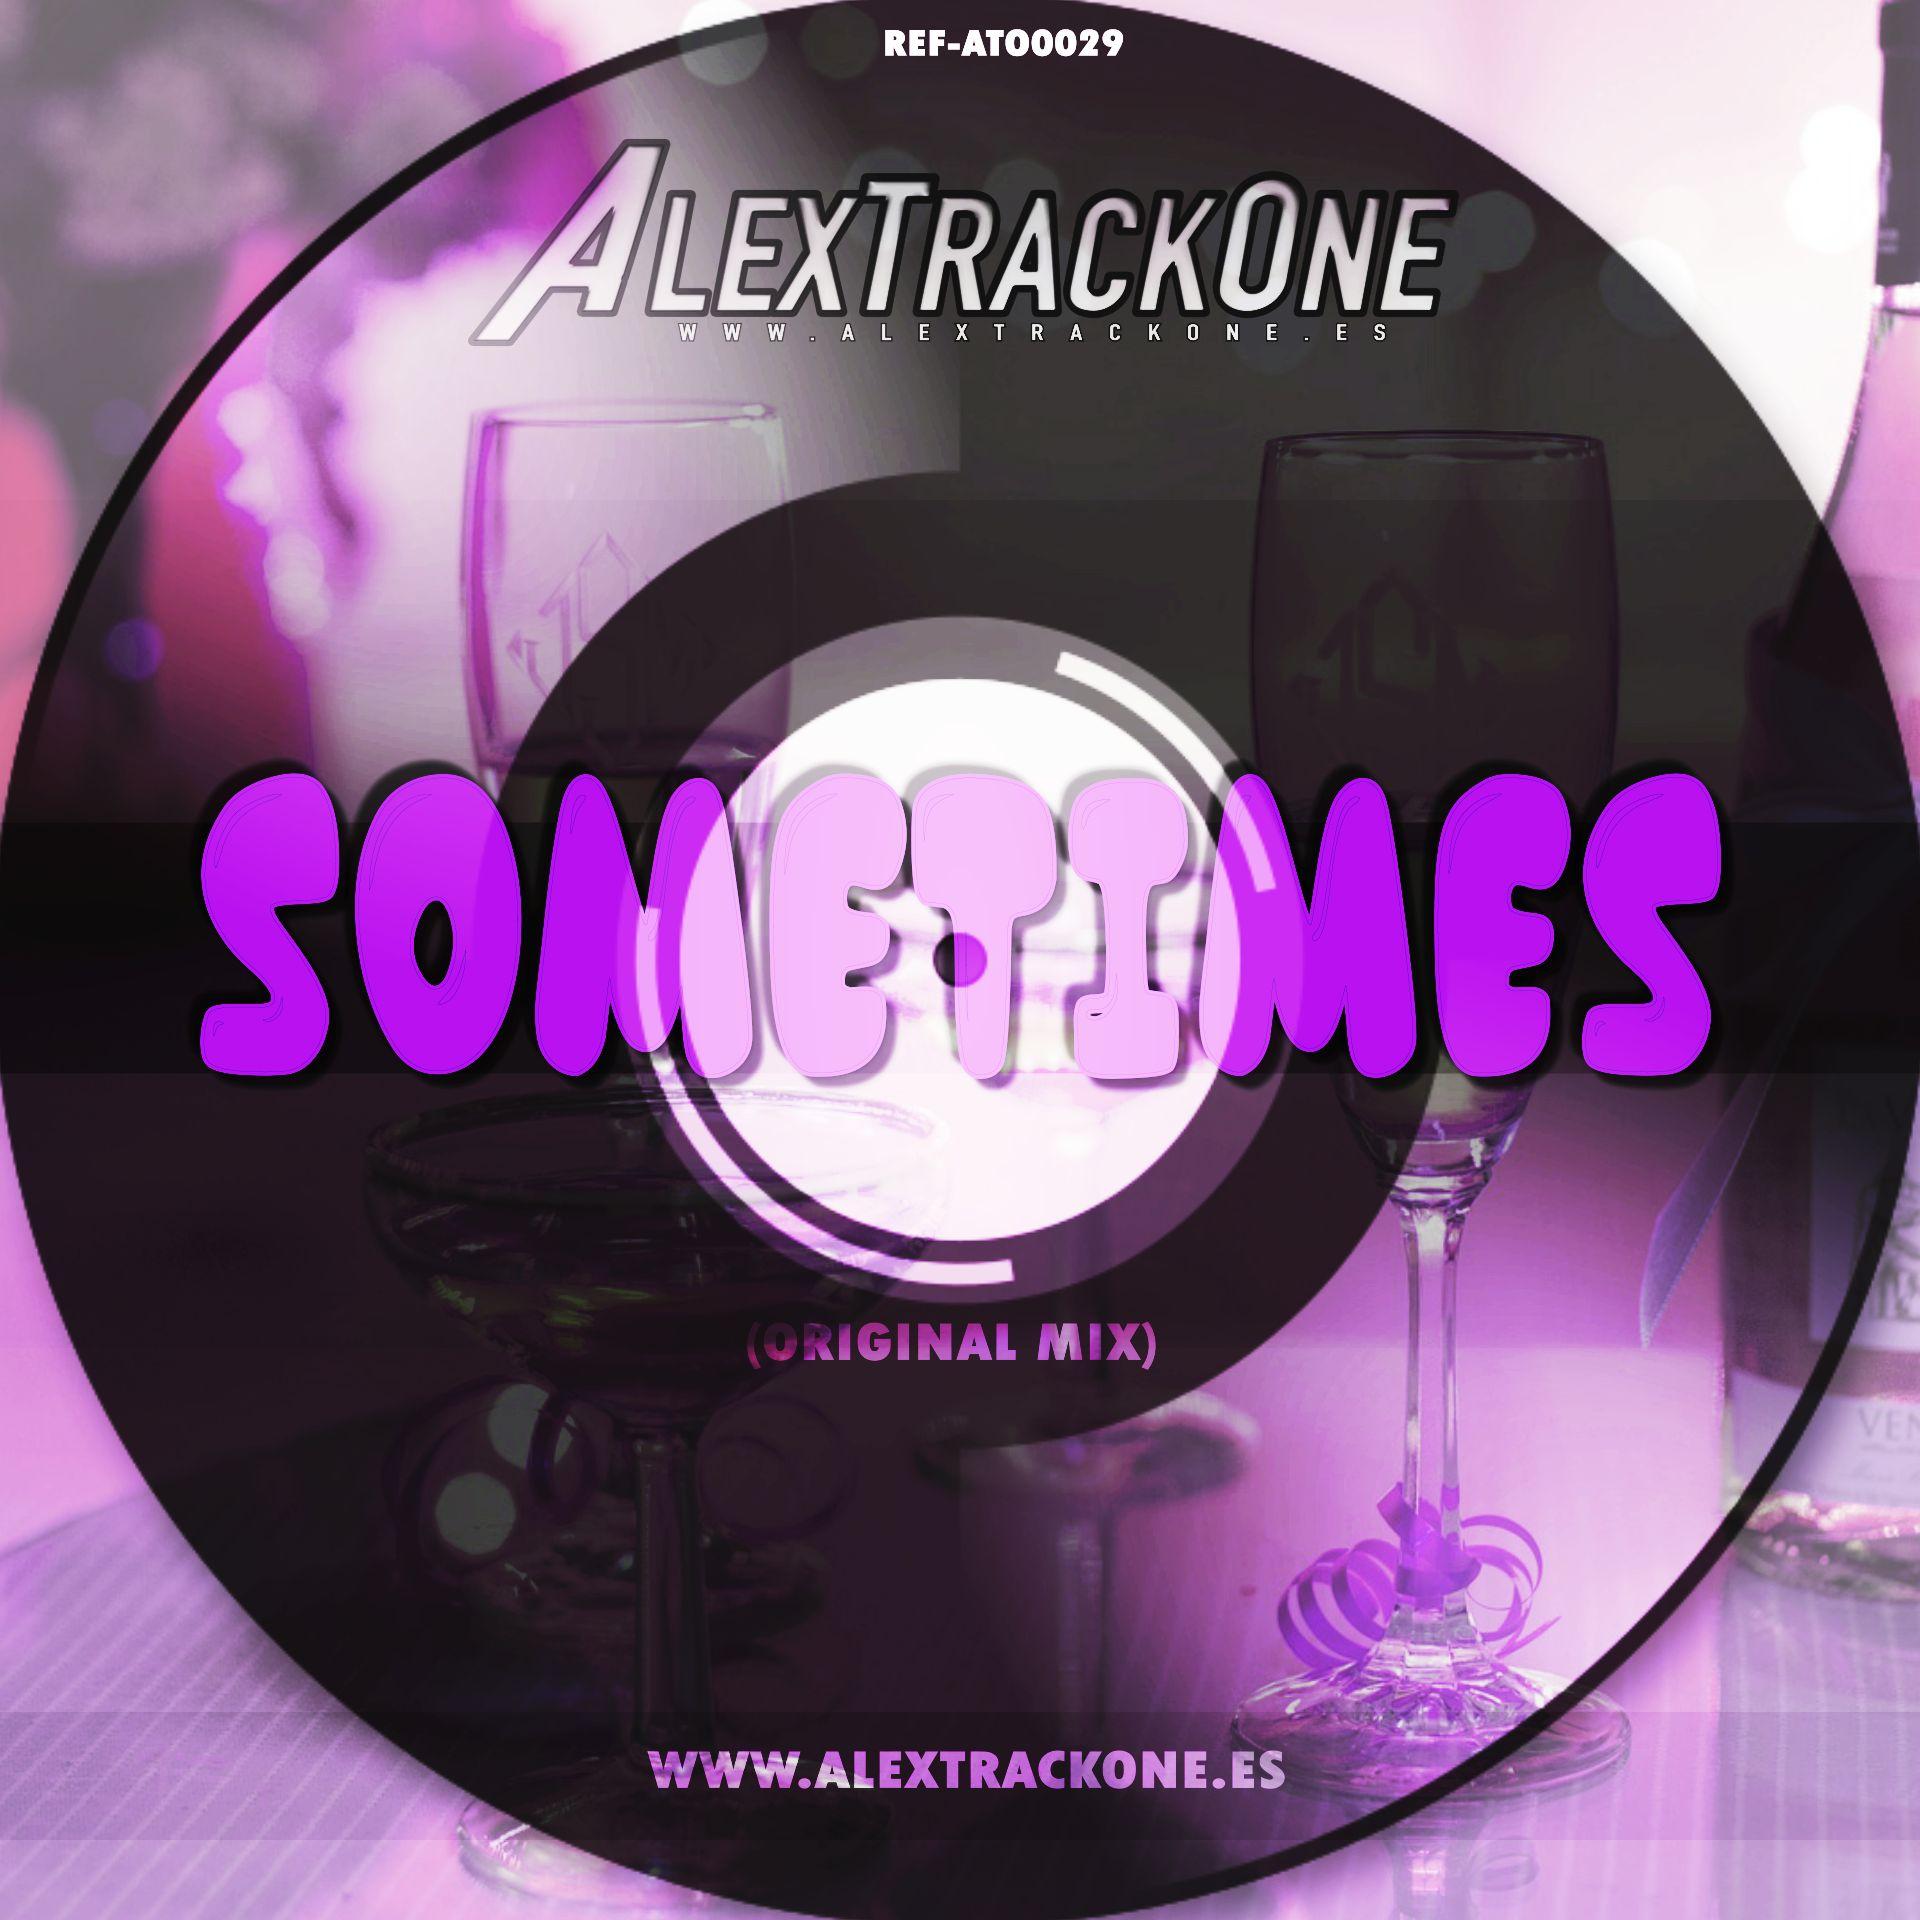 REF-ATO0029 SOMETIMES (ORIGINAL MIX) (MP3 & WAV)